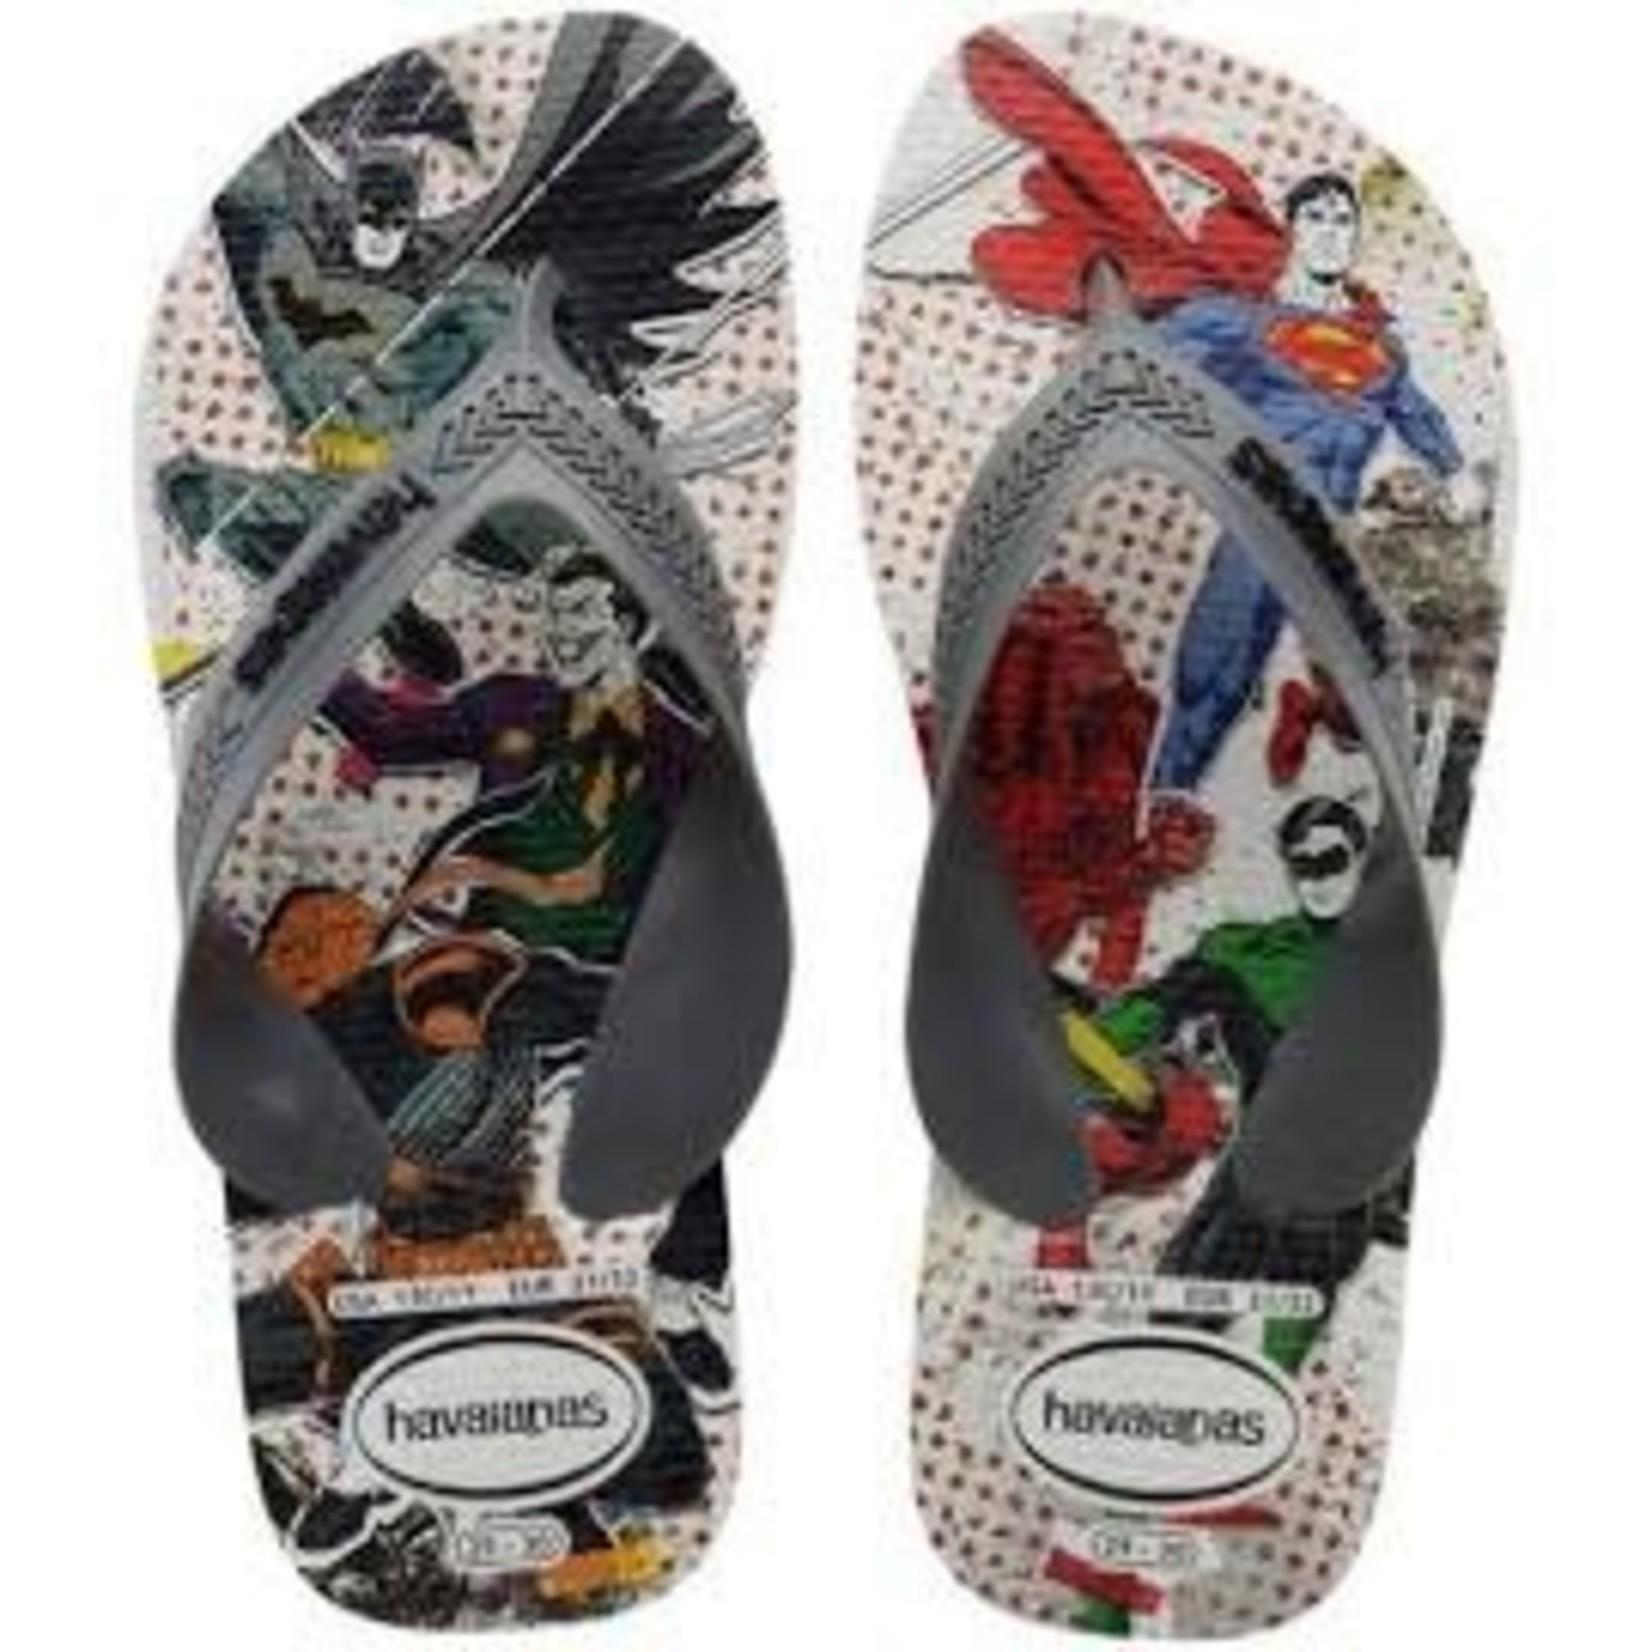 HAVAIANAS HAVAIANAS slippers max herois White